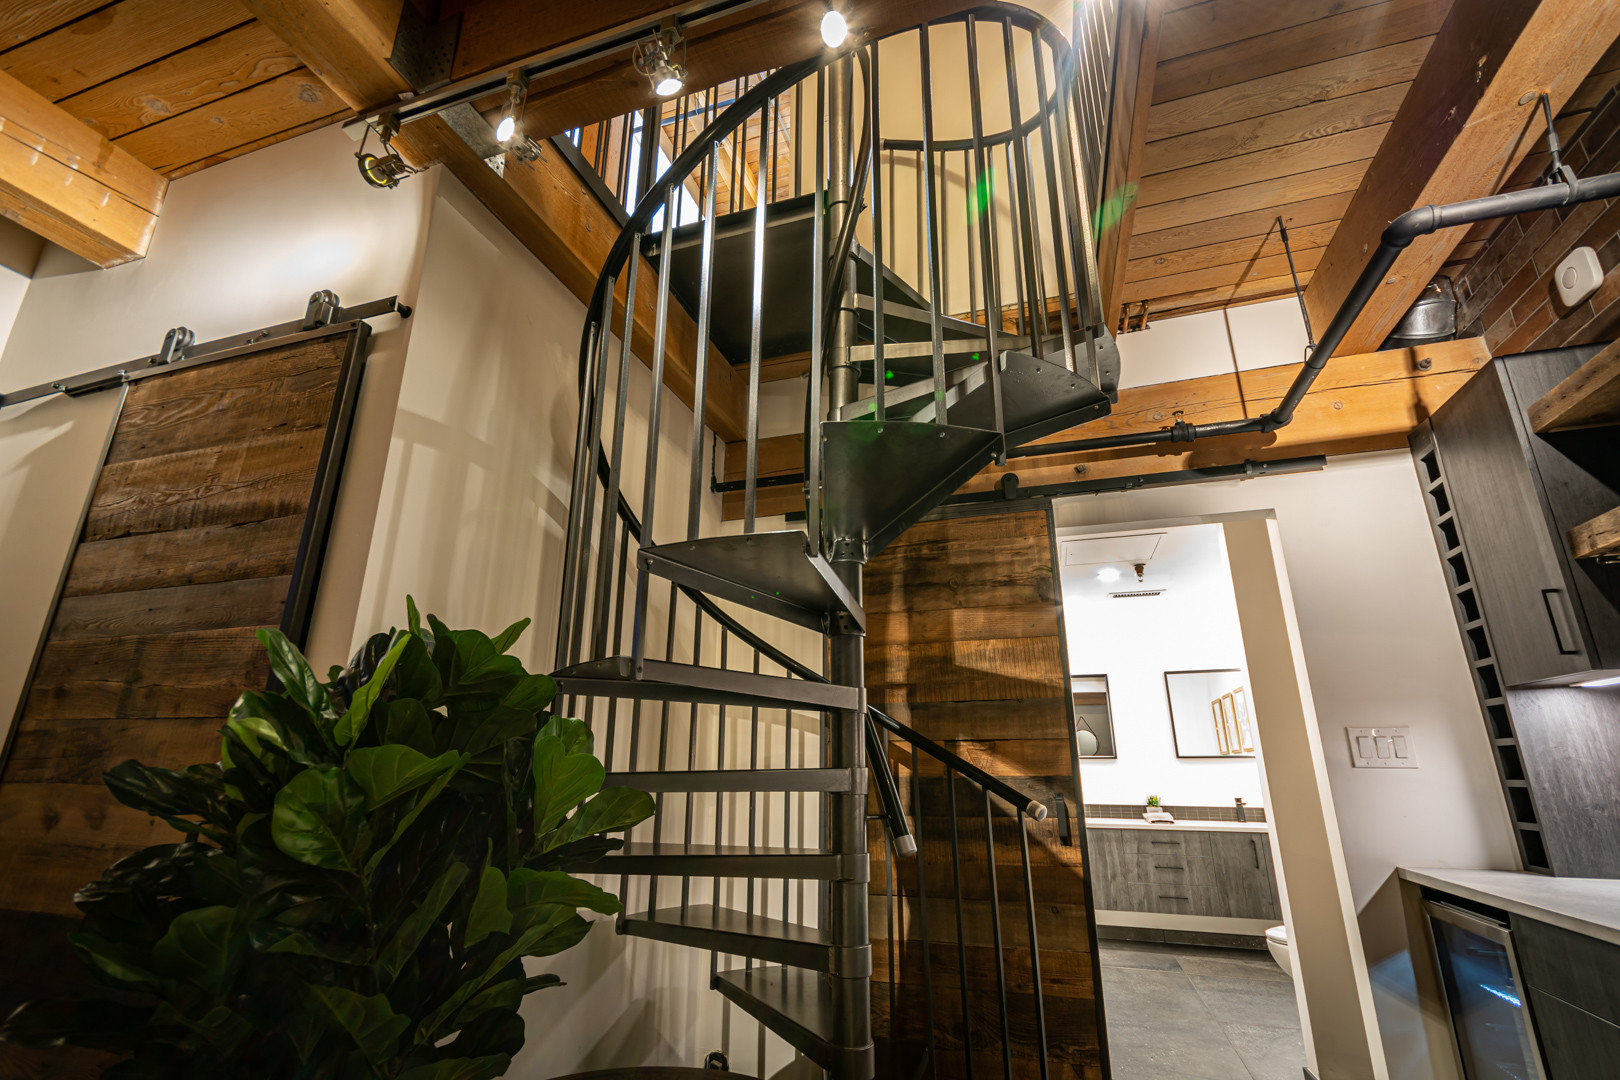 John Deere Warehouse Loft (32)